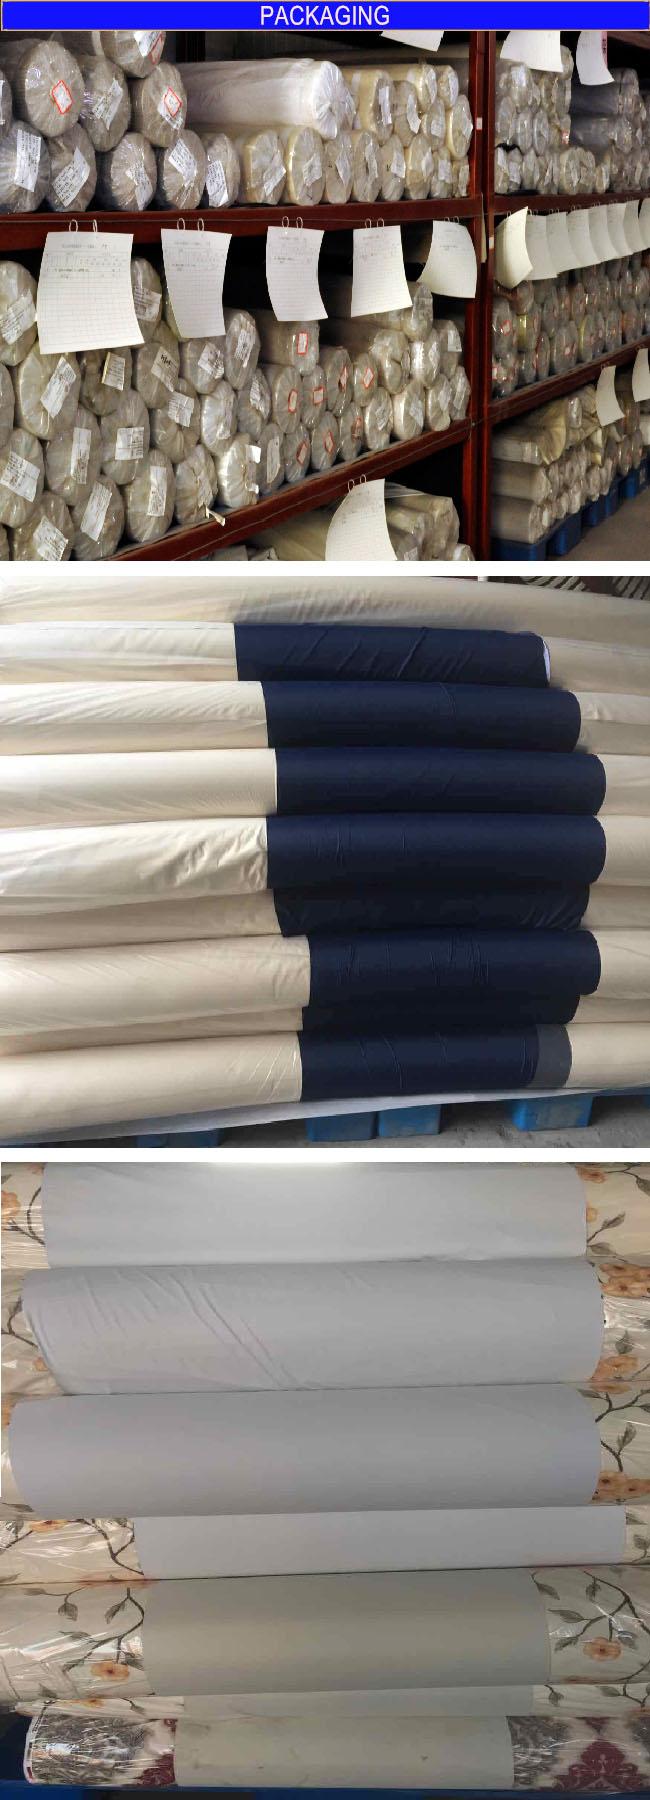 T/C 88*64 Flame Retardant Black -out Curtain Fabric